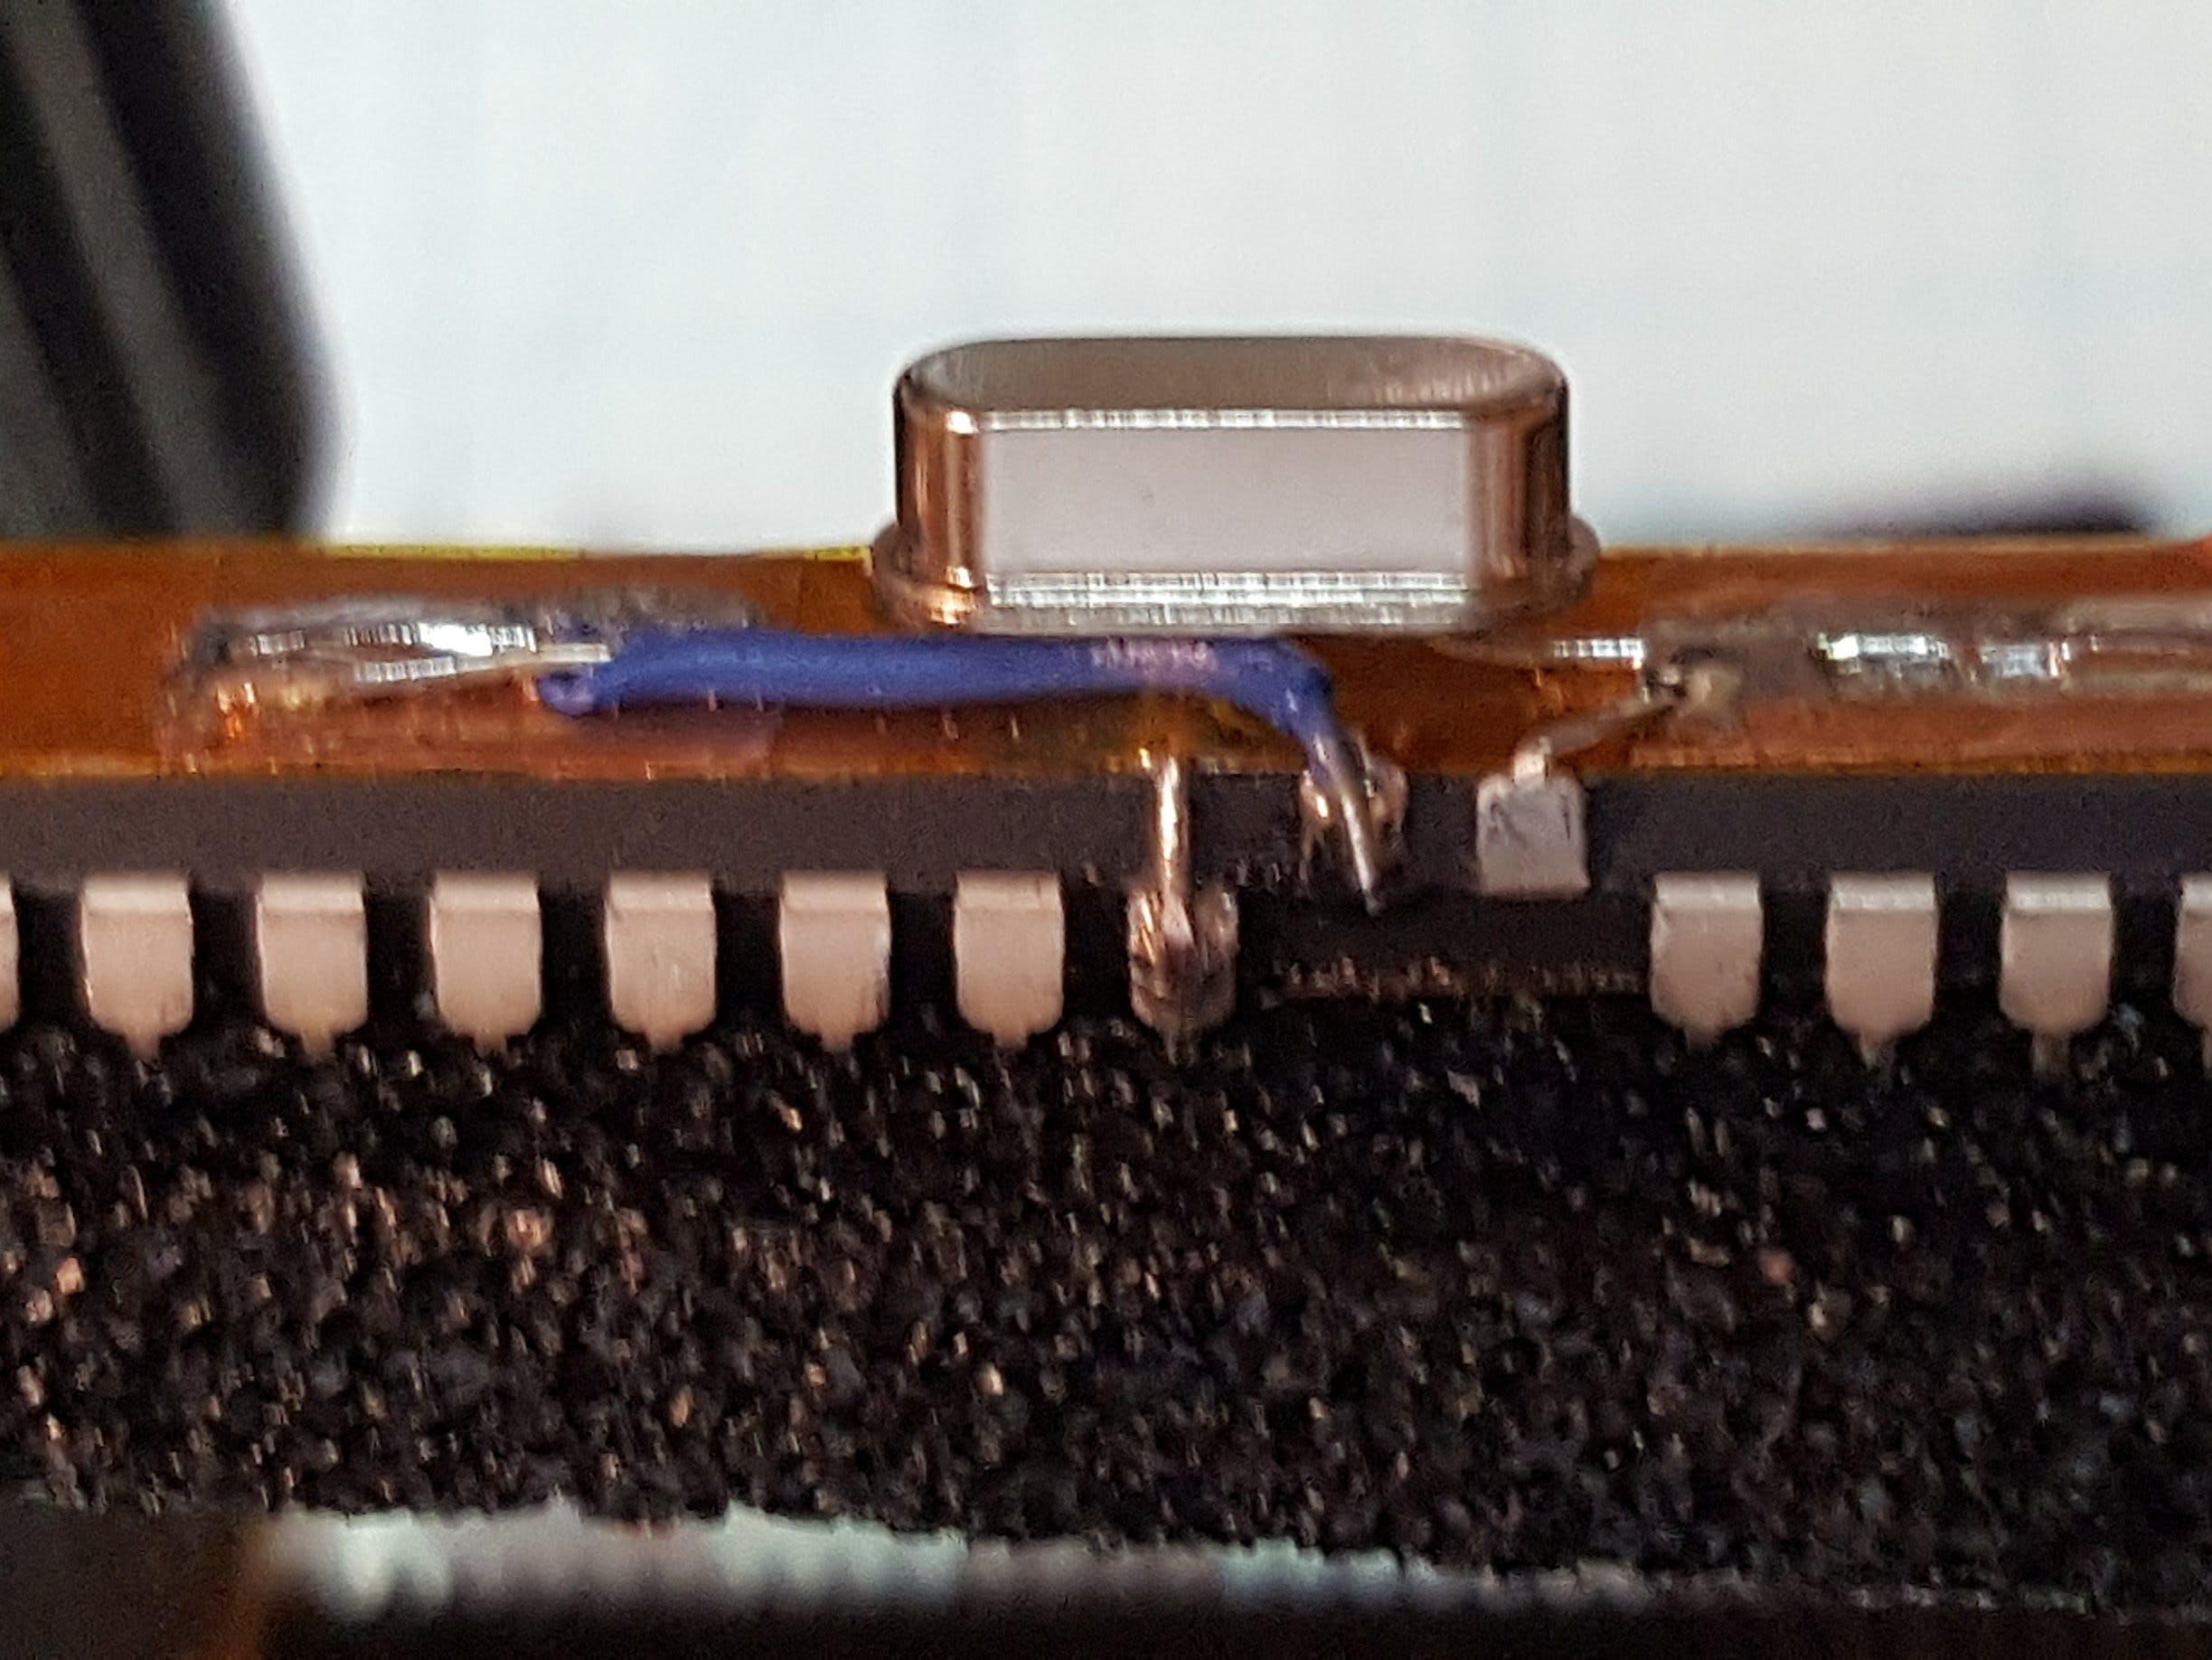 Gimmick on Barebones Arduino 16MHz